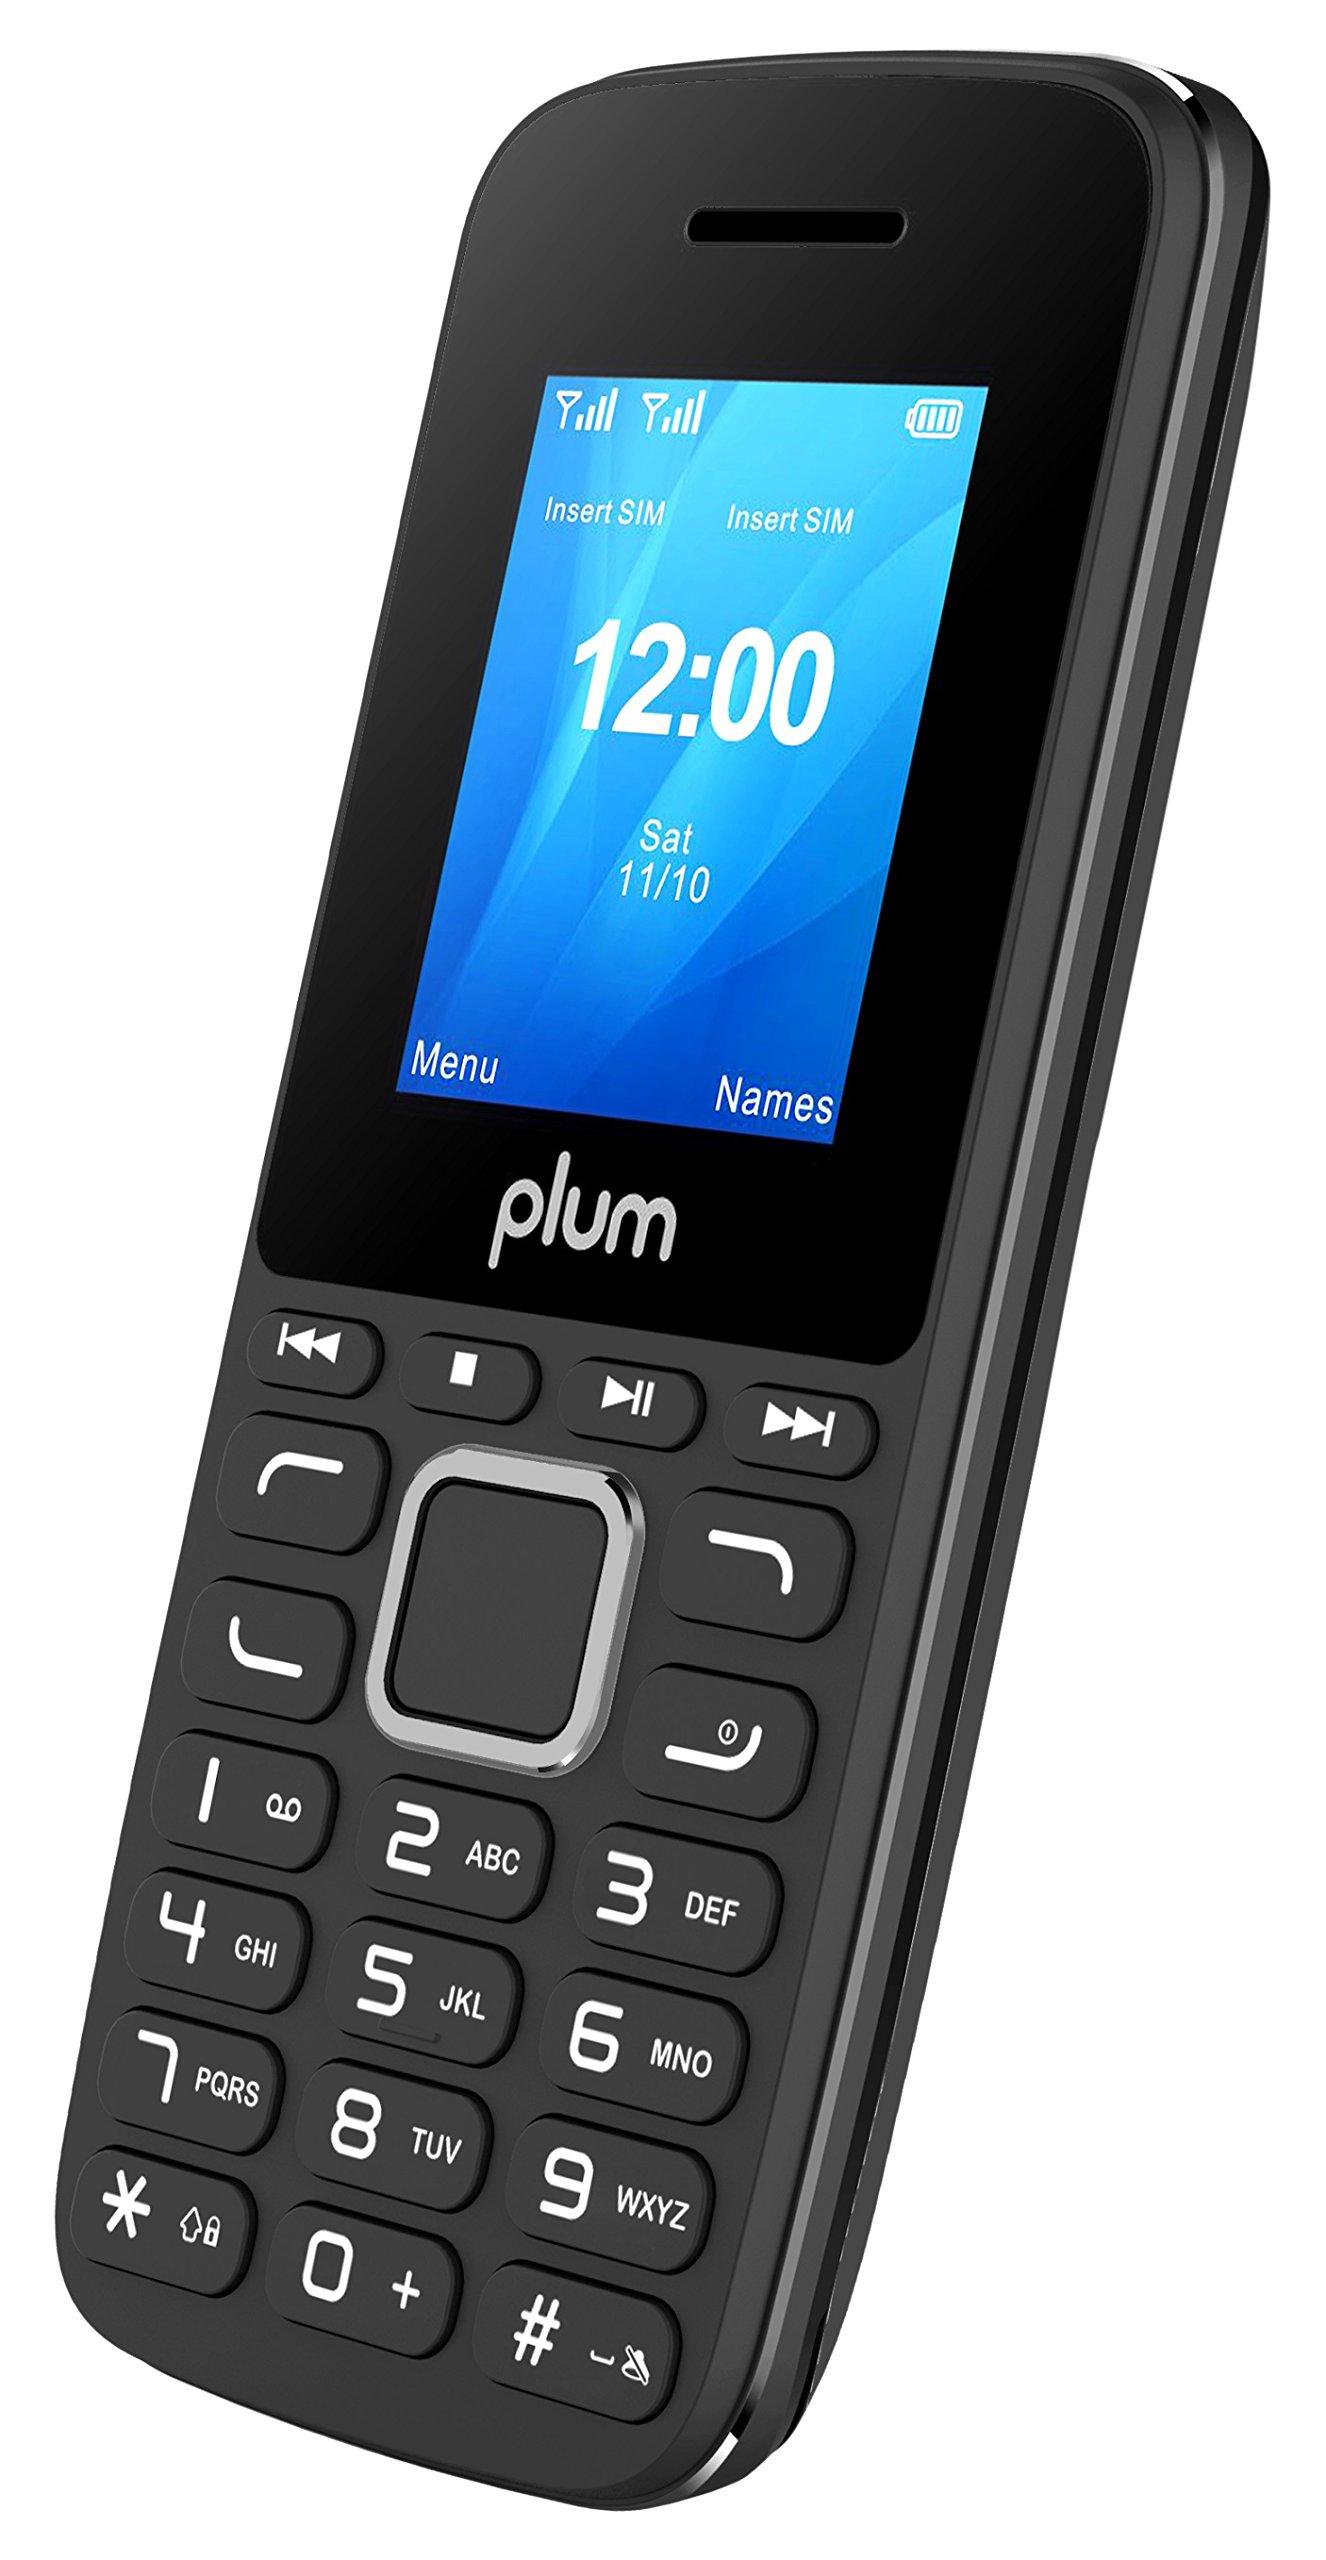 Plum Unlocked Cell Phone GSM Worldwide Dual Sim Camera FM Radio Bluetooth MP3 Play SD Card Slot Feature, 1.8'' - Black